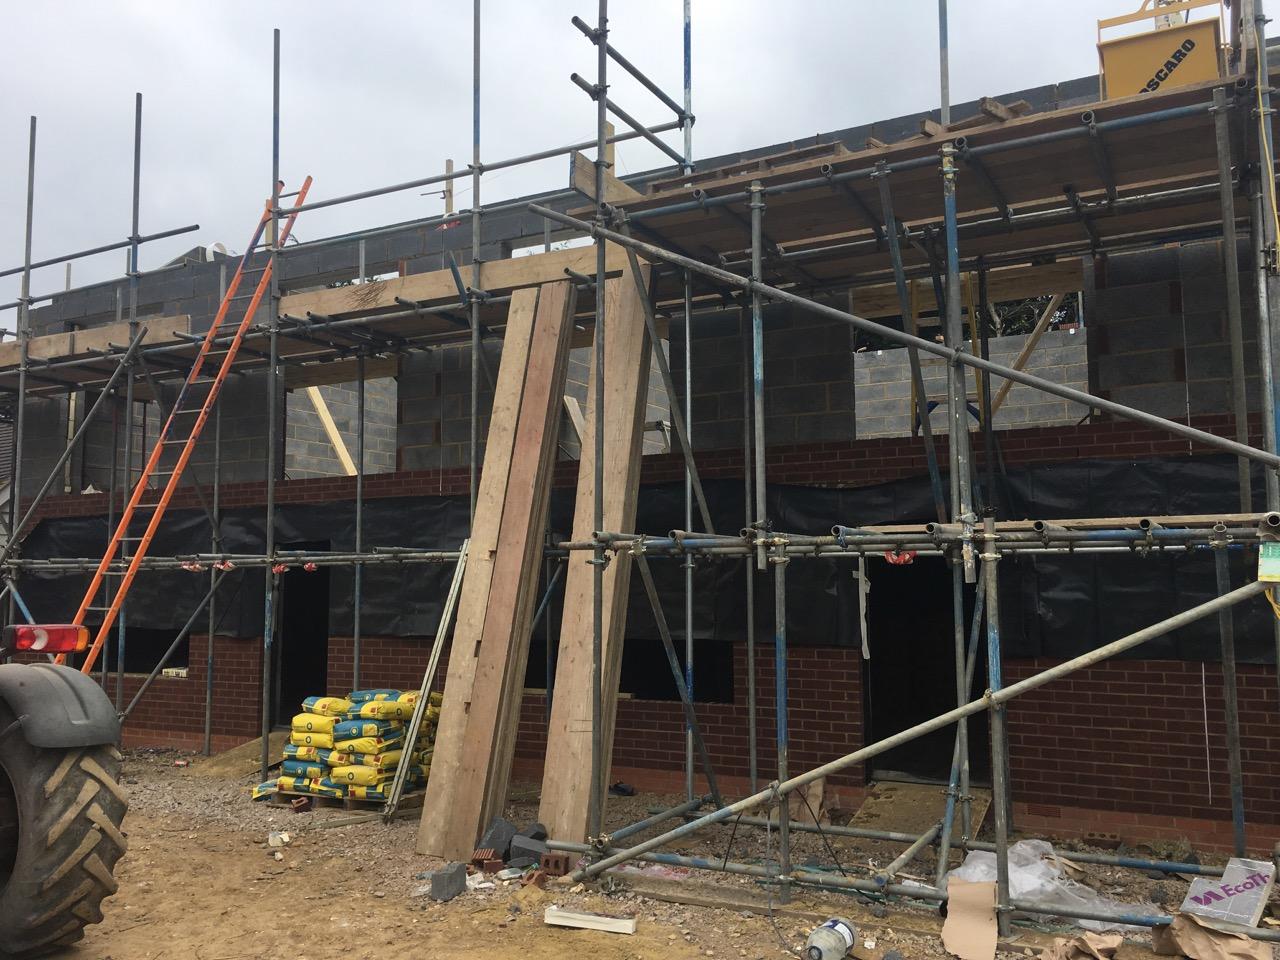 Scaffolding for roof blockwork